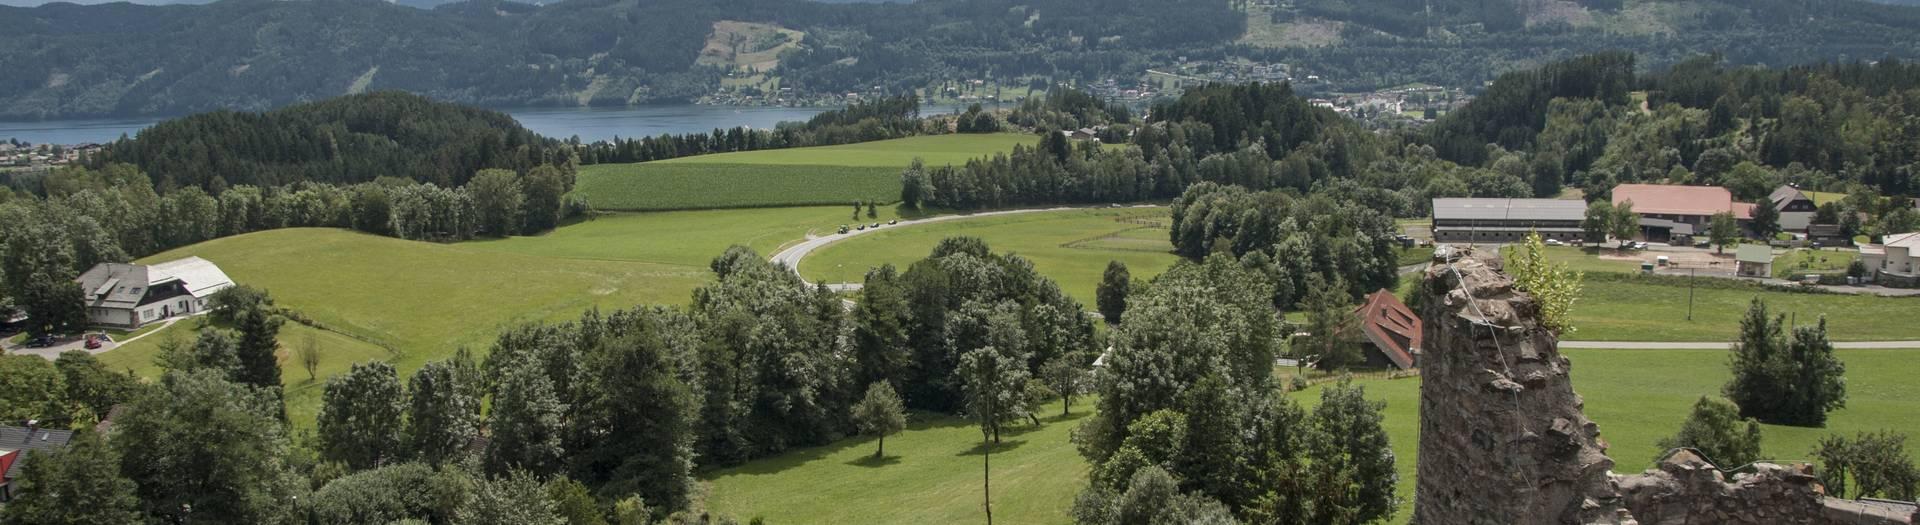 Burg Sommeregg in Seeboden am Millstätter See